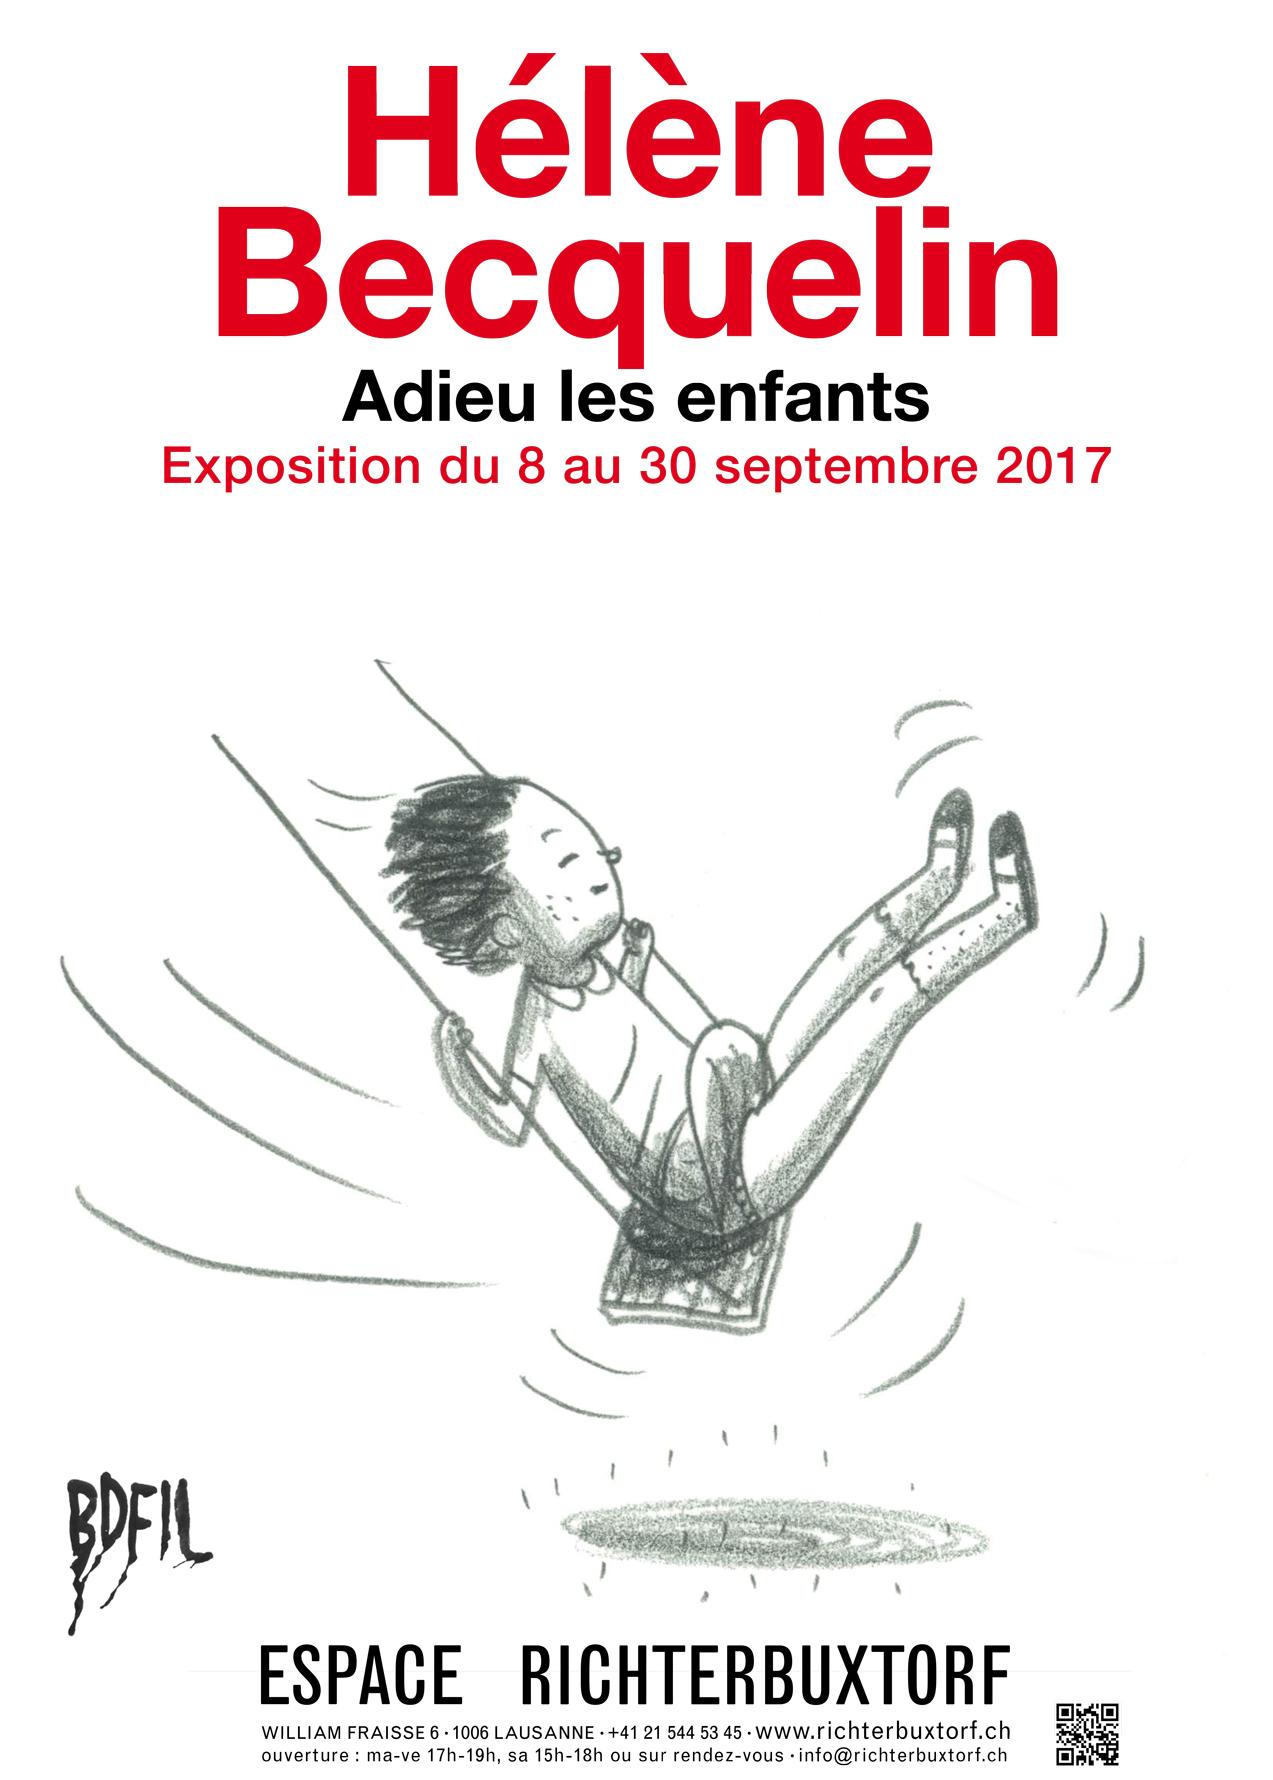 7.09-30.09 2017 Hélène Becquelin: Adieu les enfants